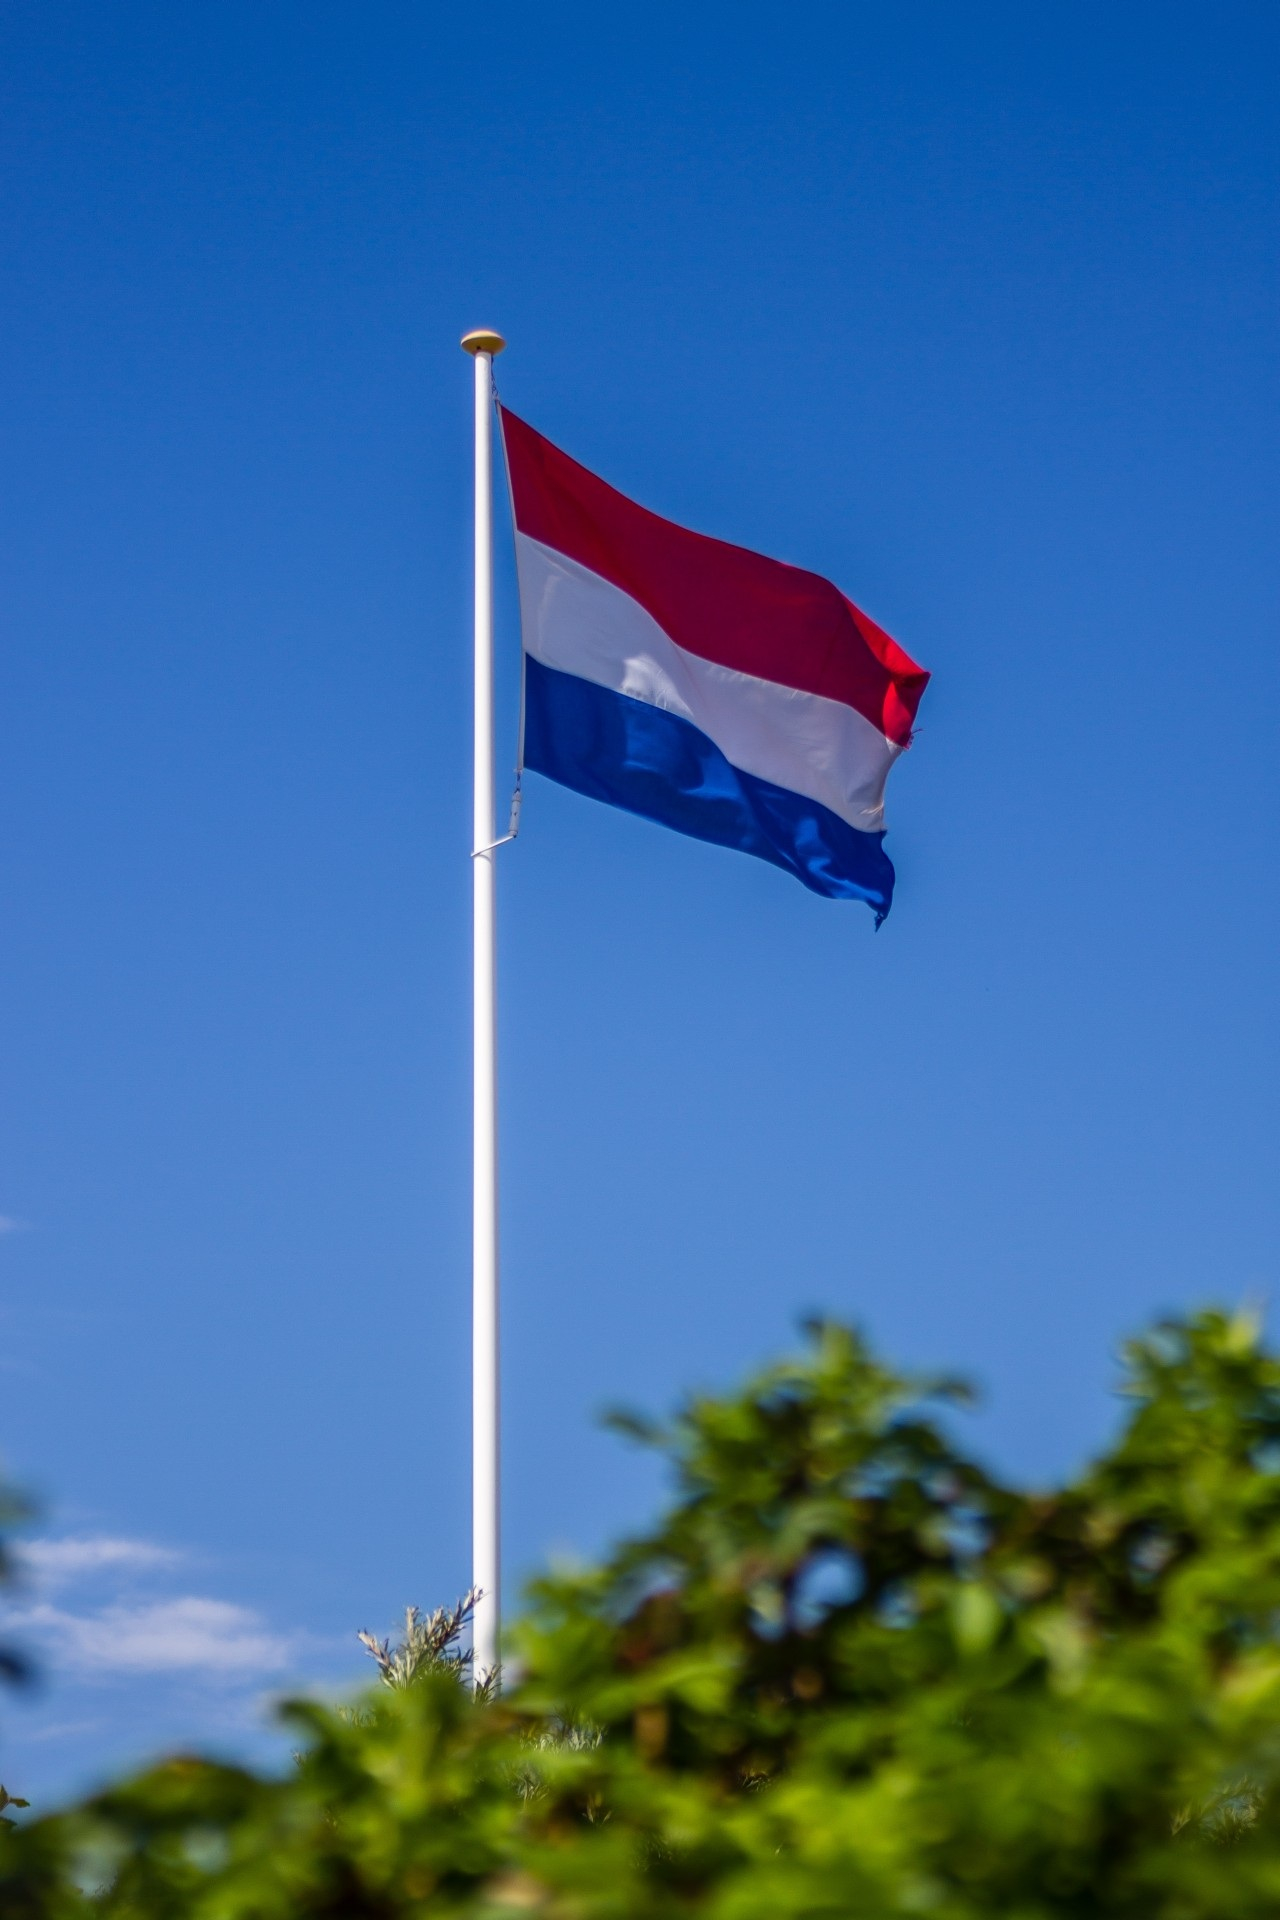 Canva - Flag, Holland, Netherlands, Sky, Blue, Red, White.jpg